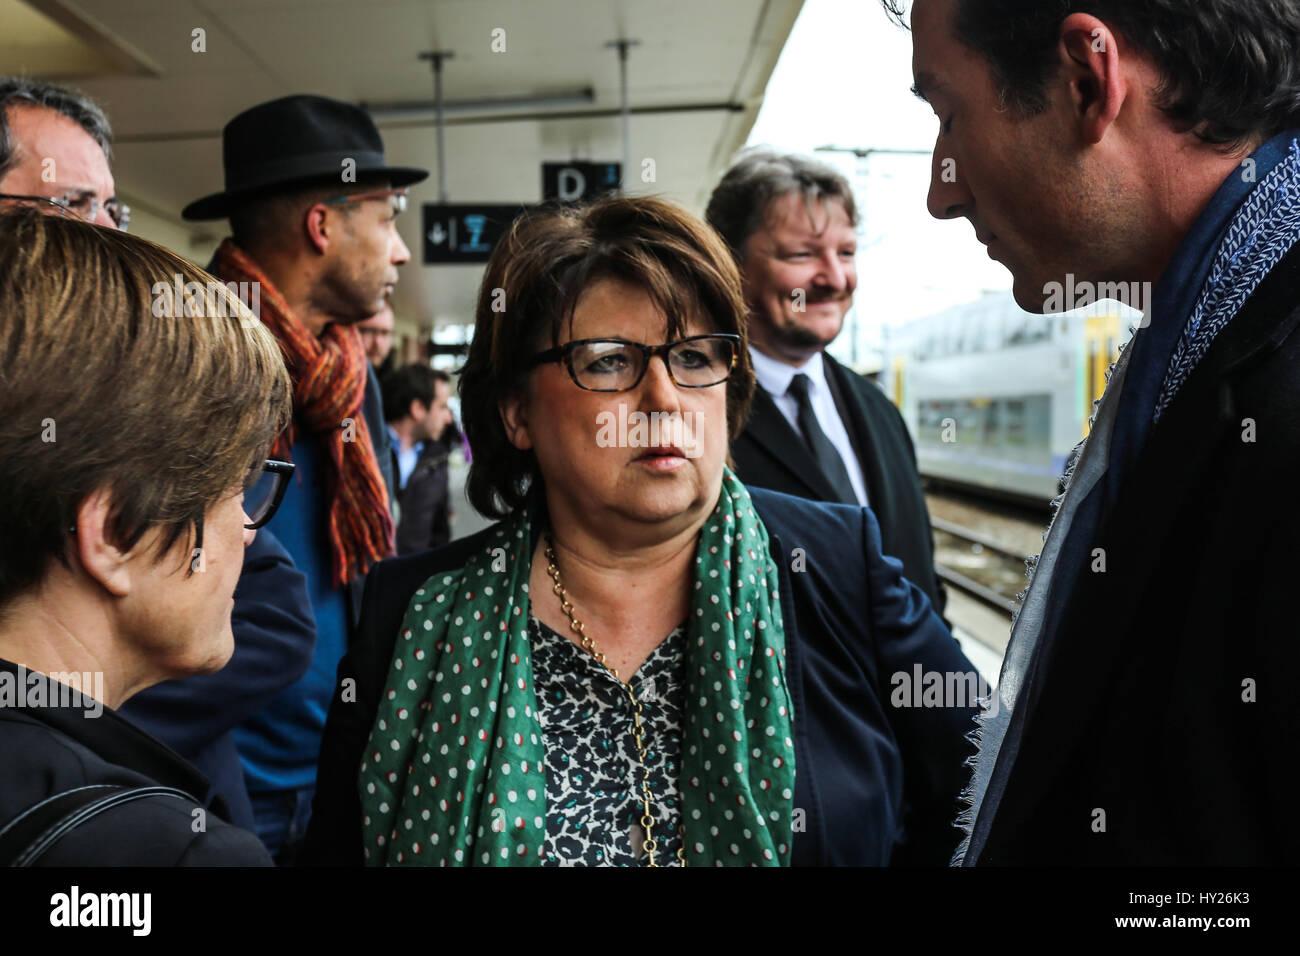 Benoit Hamon and Martine Aubry in campaign in Douai. -  29/03/2017  -  France / Nord-Pas-de-Calais  -  Benoit Hamon, - Stock Image